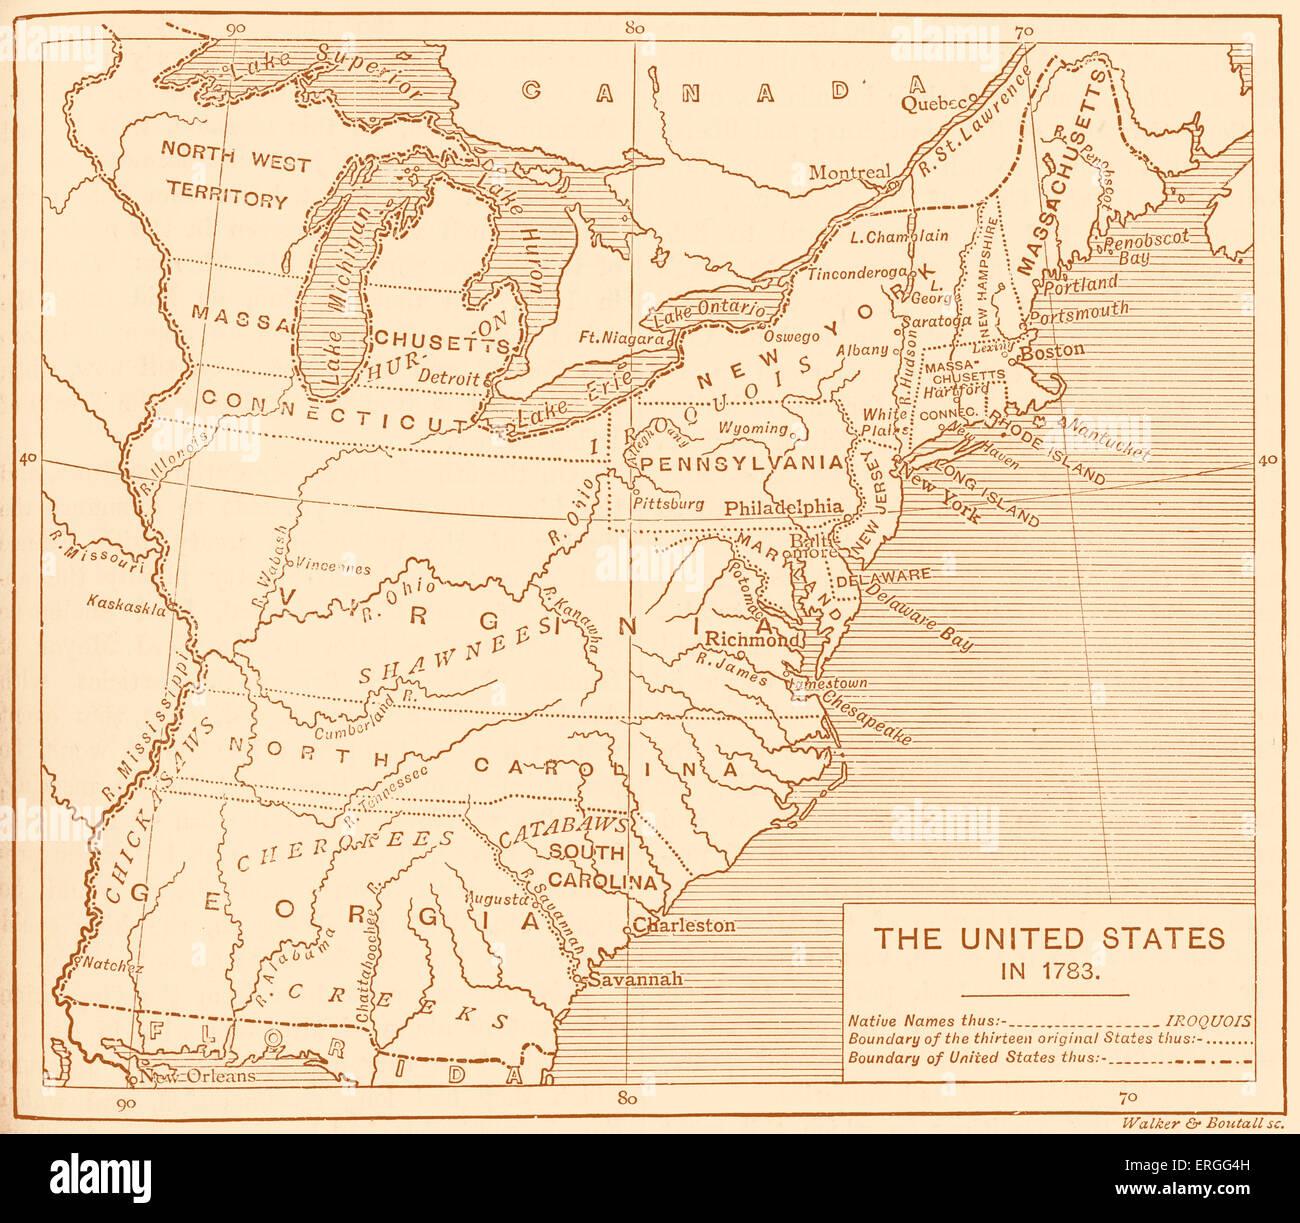 Usa Map States Names Stockfotos & Usa Map States Names Bilder - Alamy